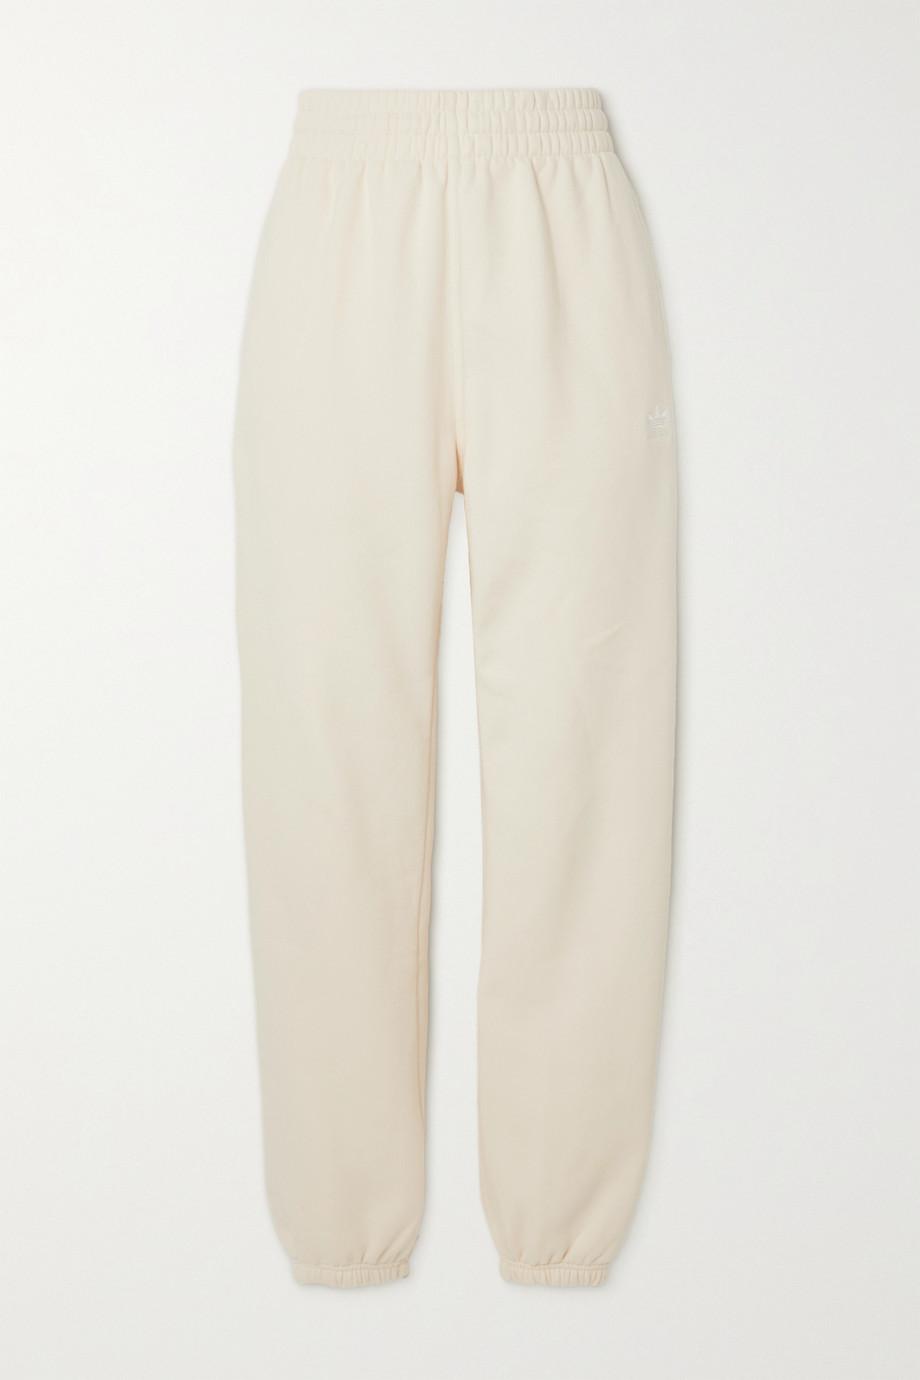 adidas Originals Essentials cotton-blend jersey track pants